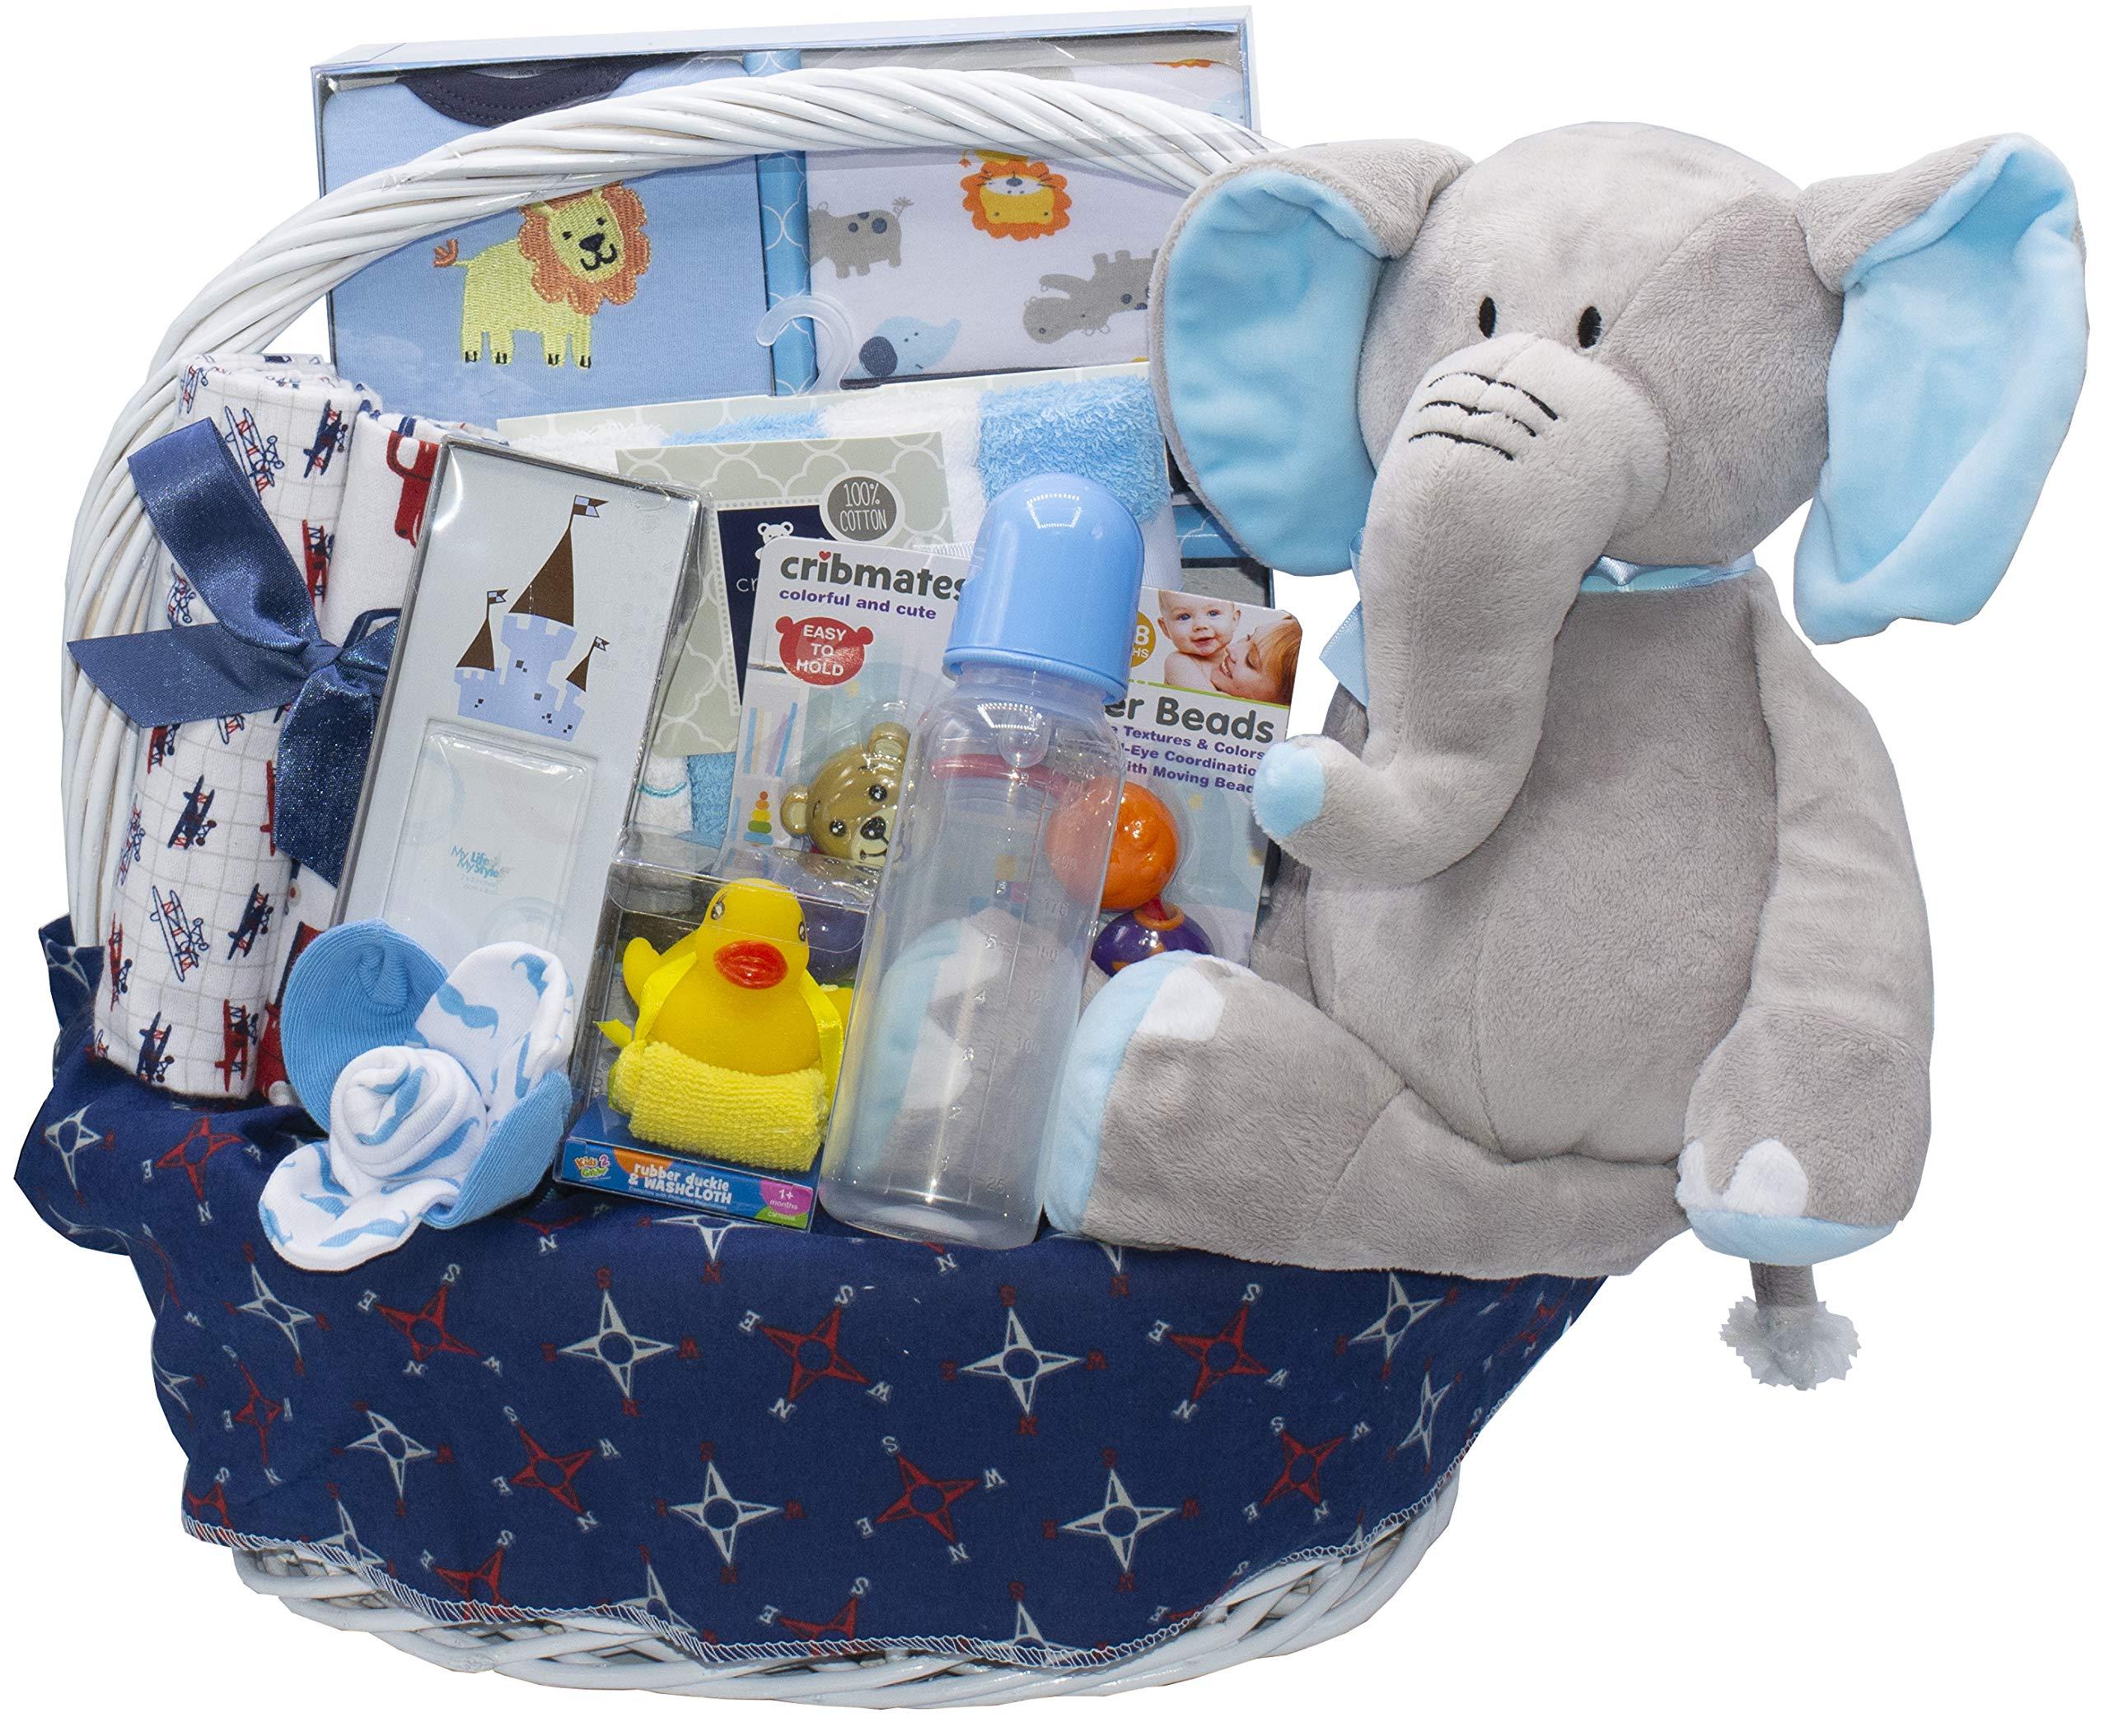 Bundle of Joy Deluxe Baby Girl or Boy Gift Basket (Medium) | 21 Piece New Baby Gift Set (Blue)